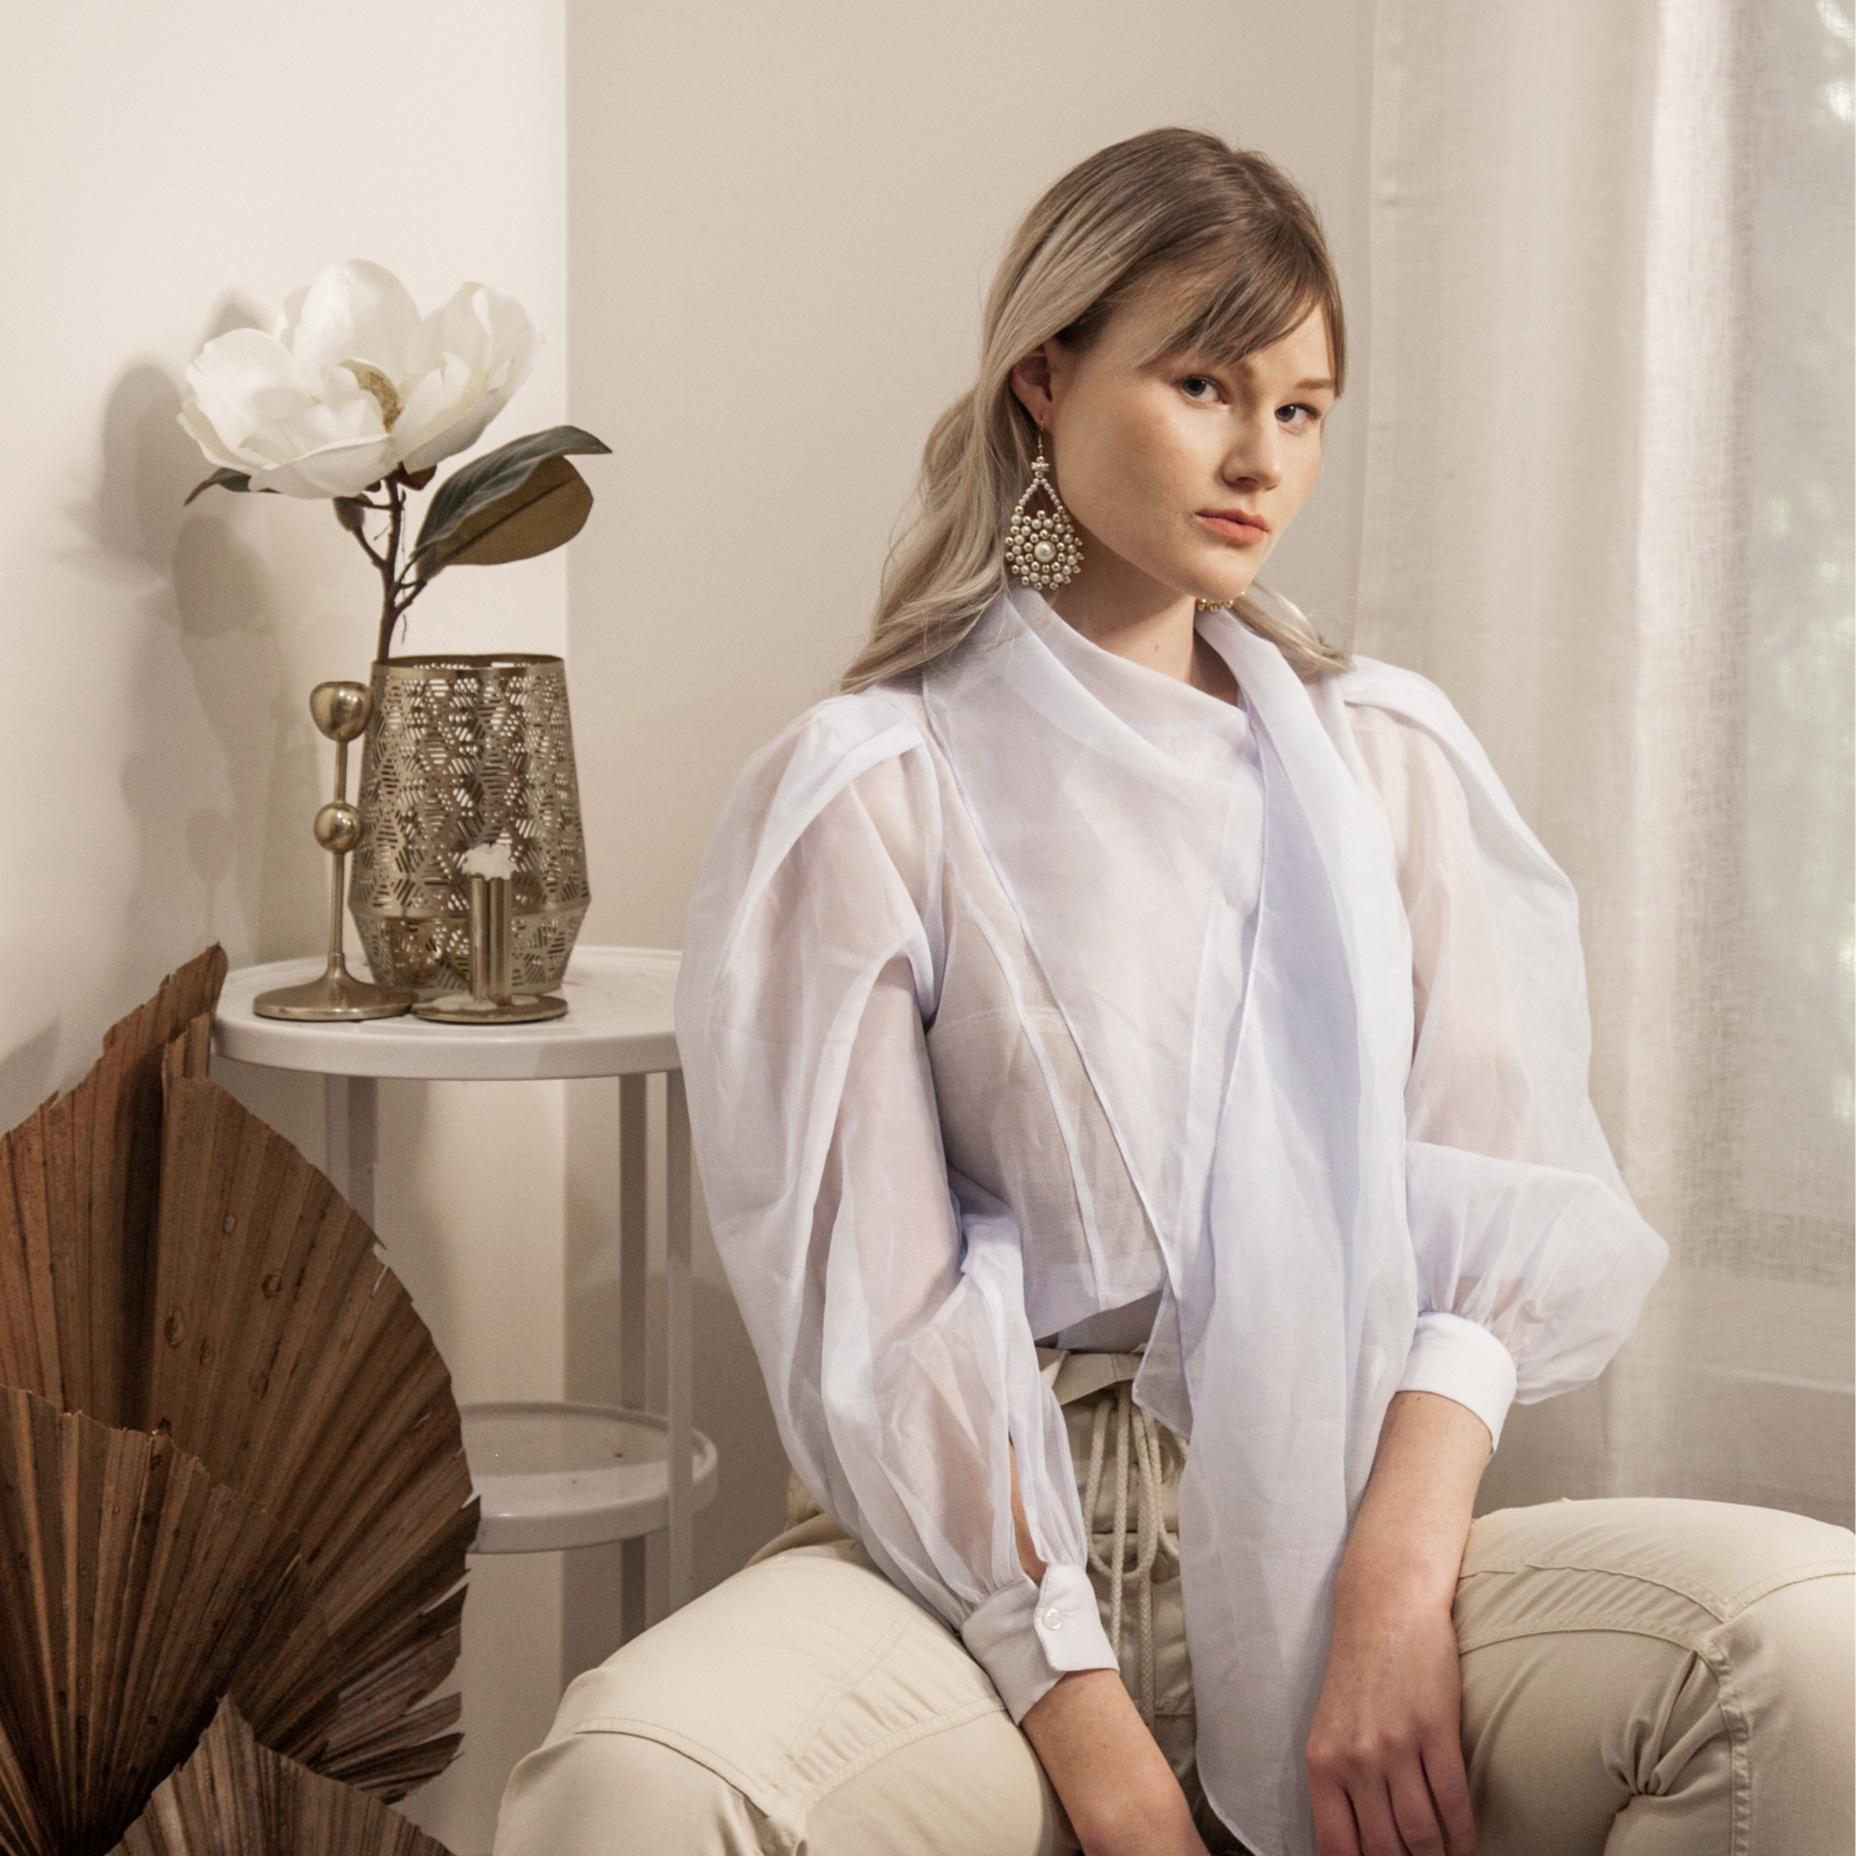 WEAR WITH - Crisp linen, soft tones and lush sheer fabrics.